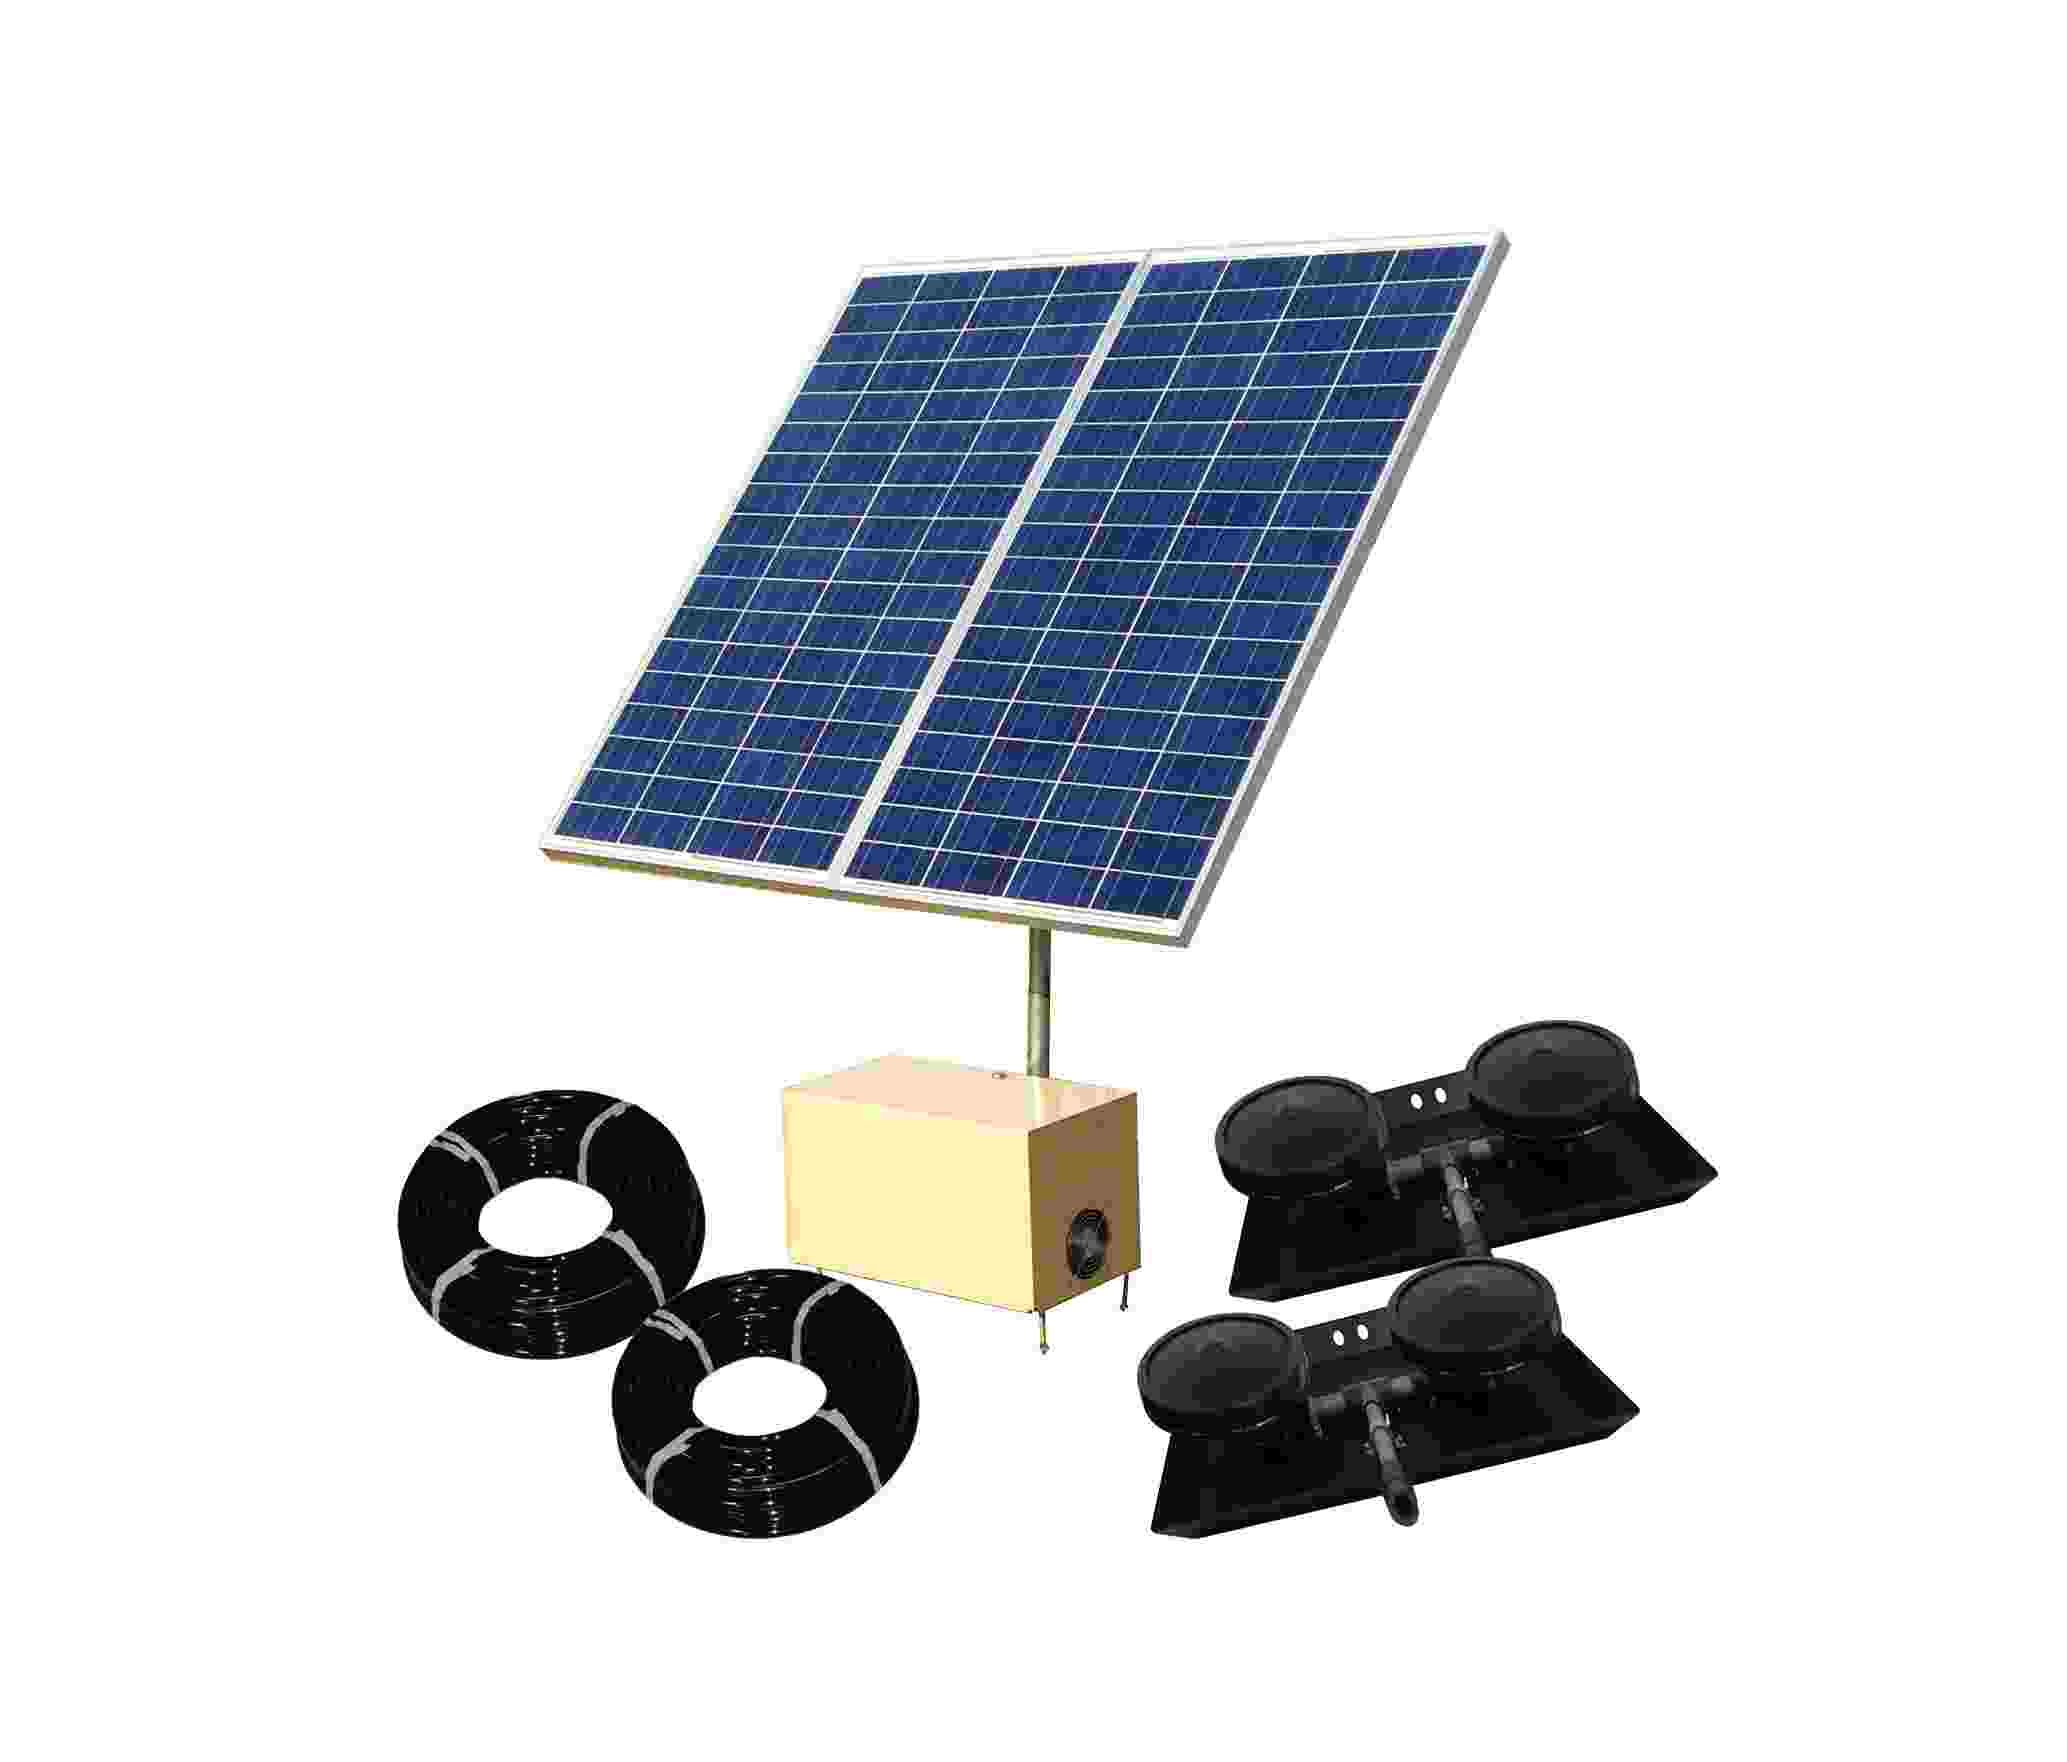 Solar Aerator DD 3